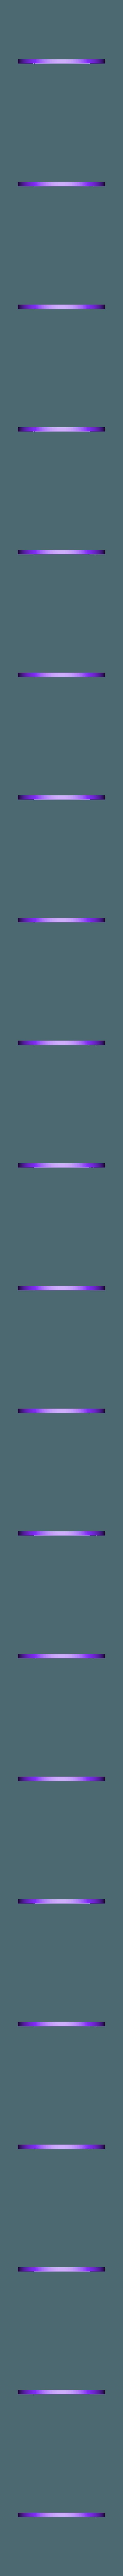 Suns_purple.STL Download free STL file Minimal Multi-color NBA coasters • 3D print object, MosaicManufacturing